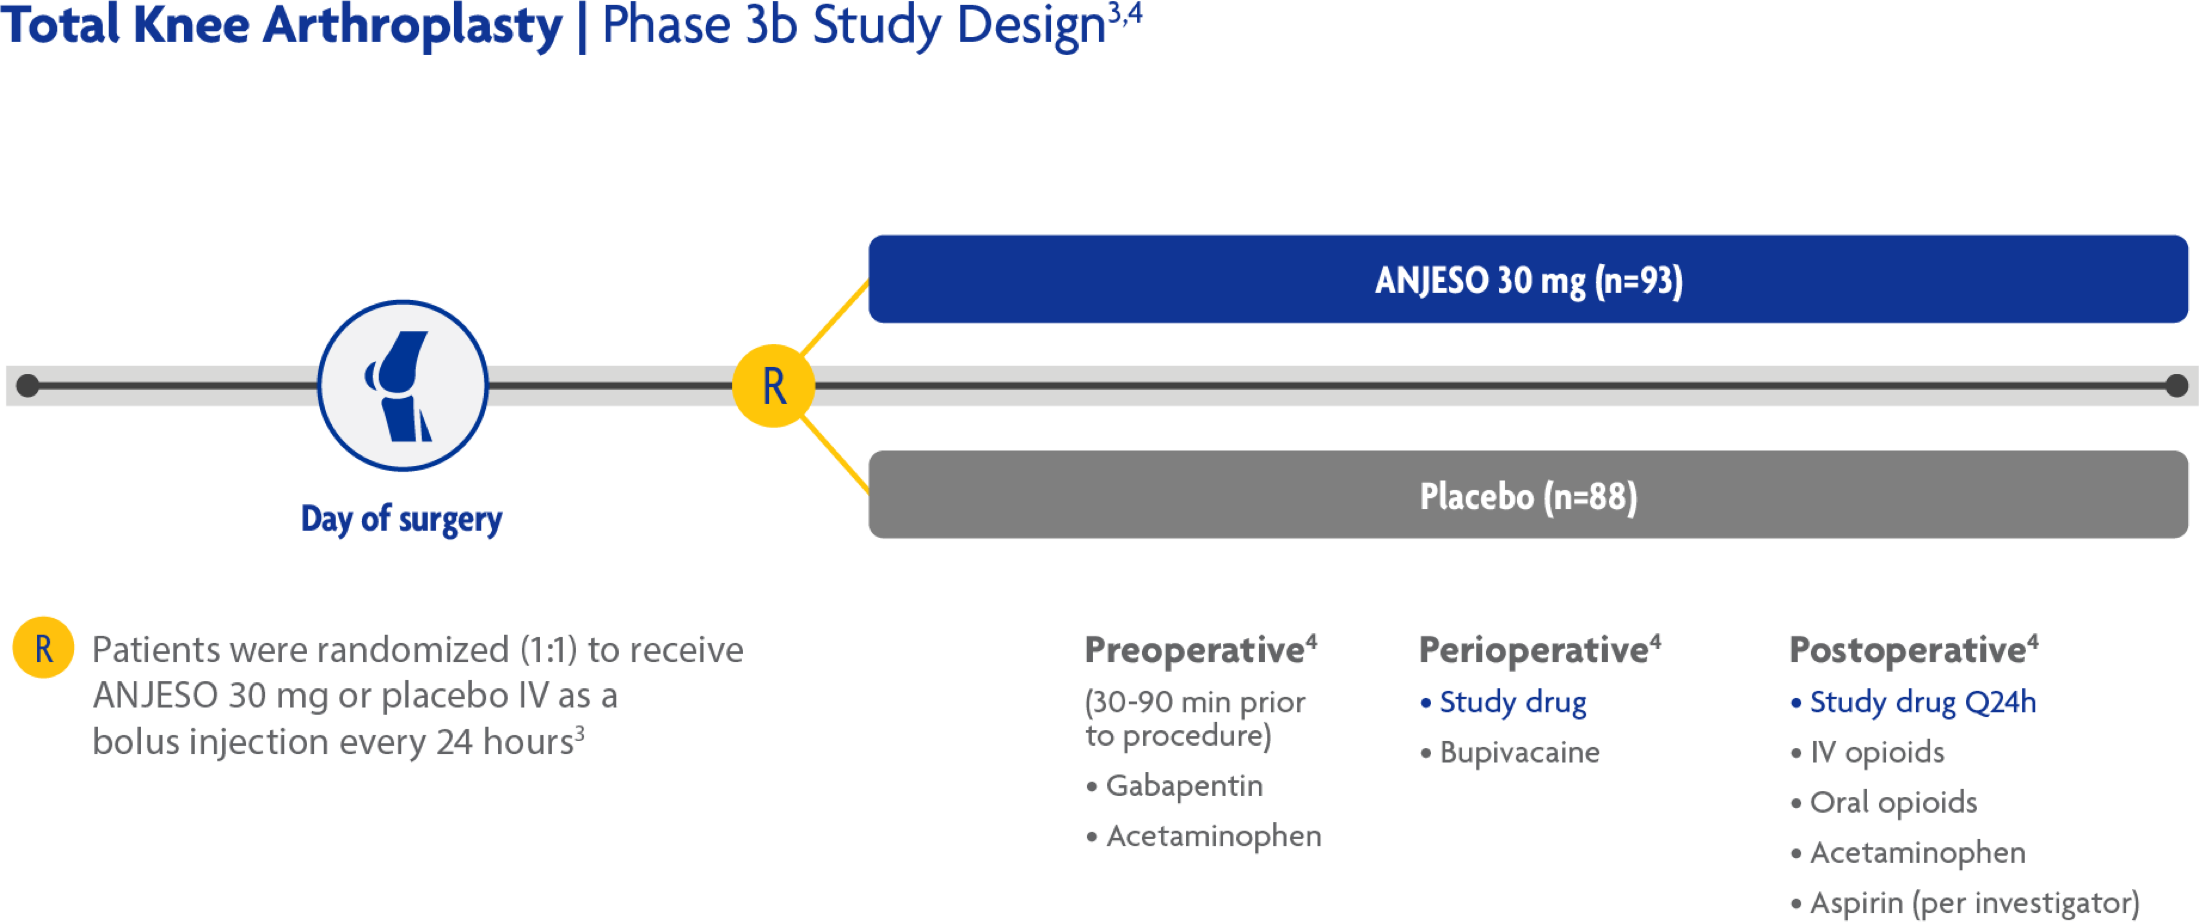 phase 3b study design